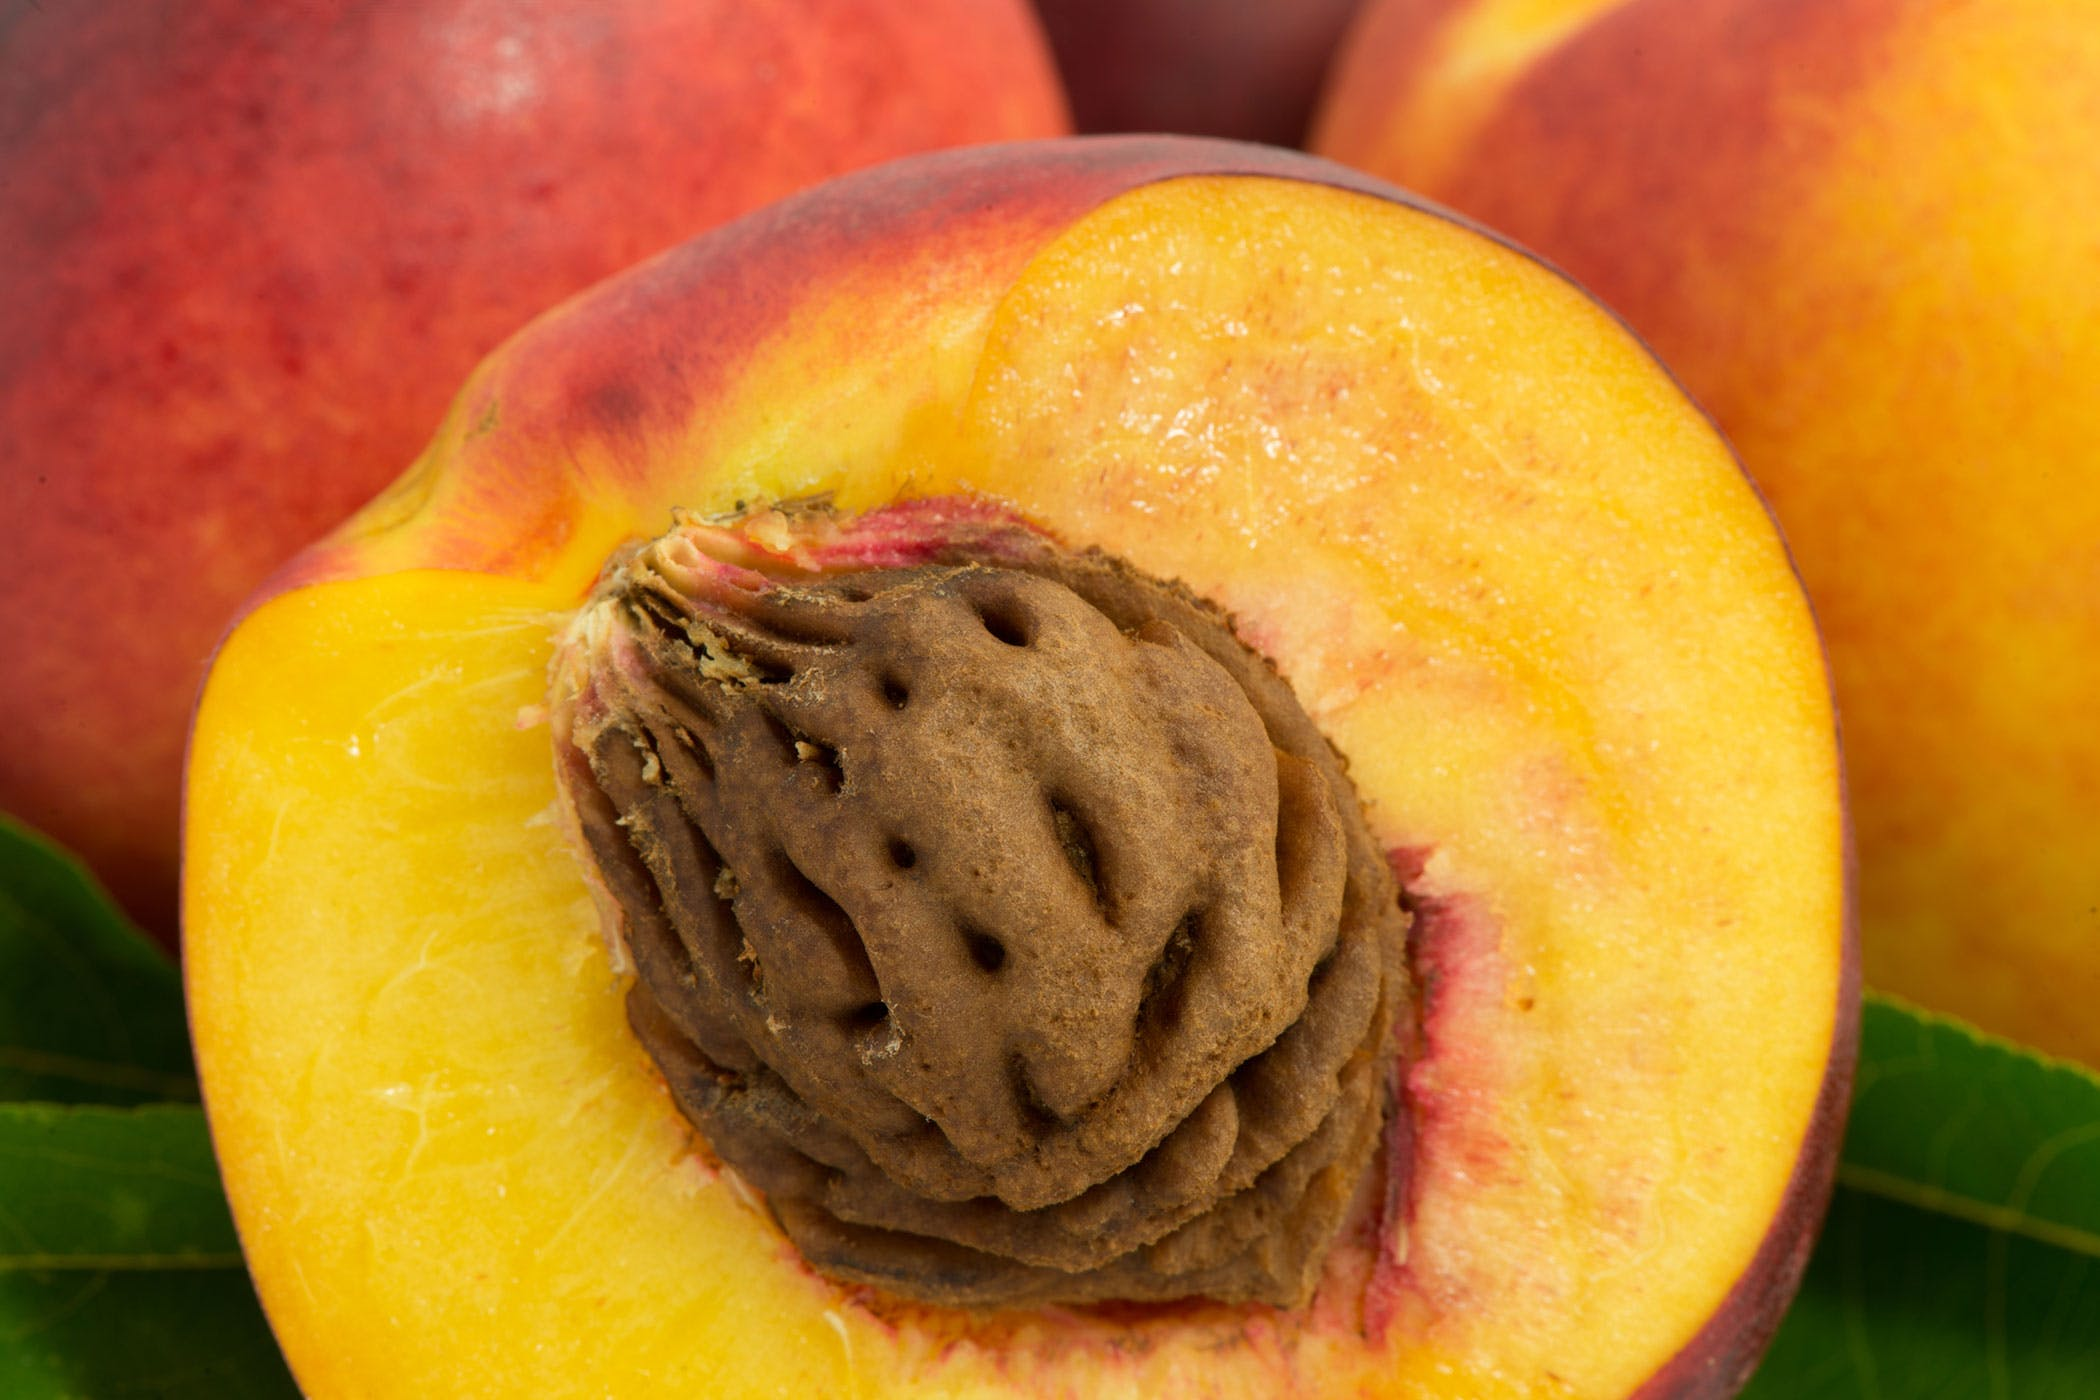 peach-pits-poisoning.jpg